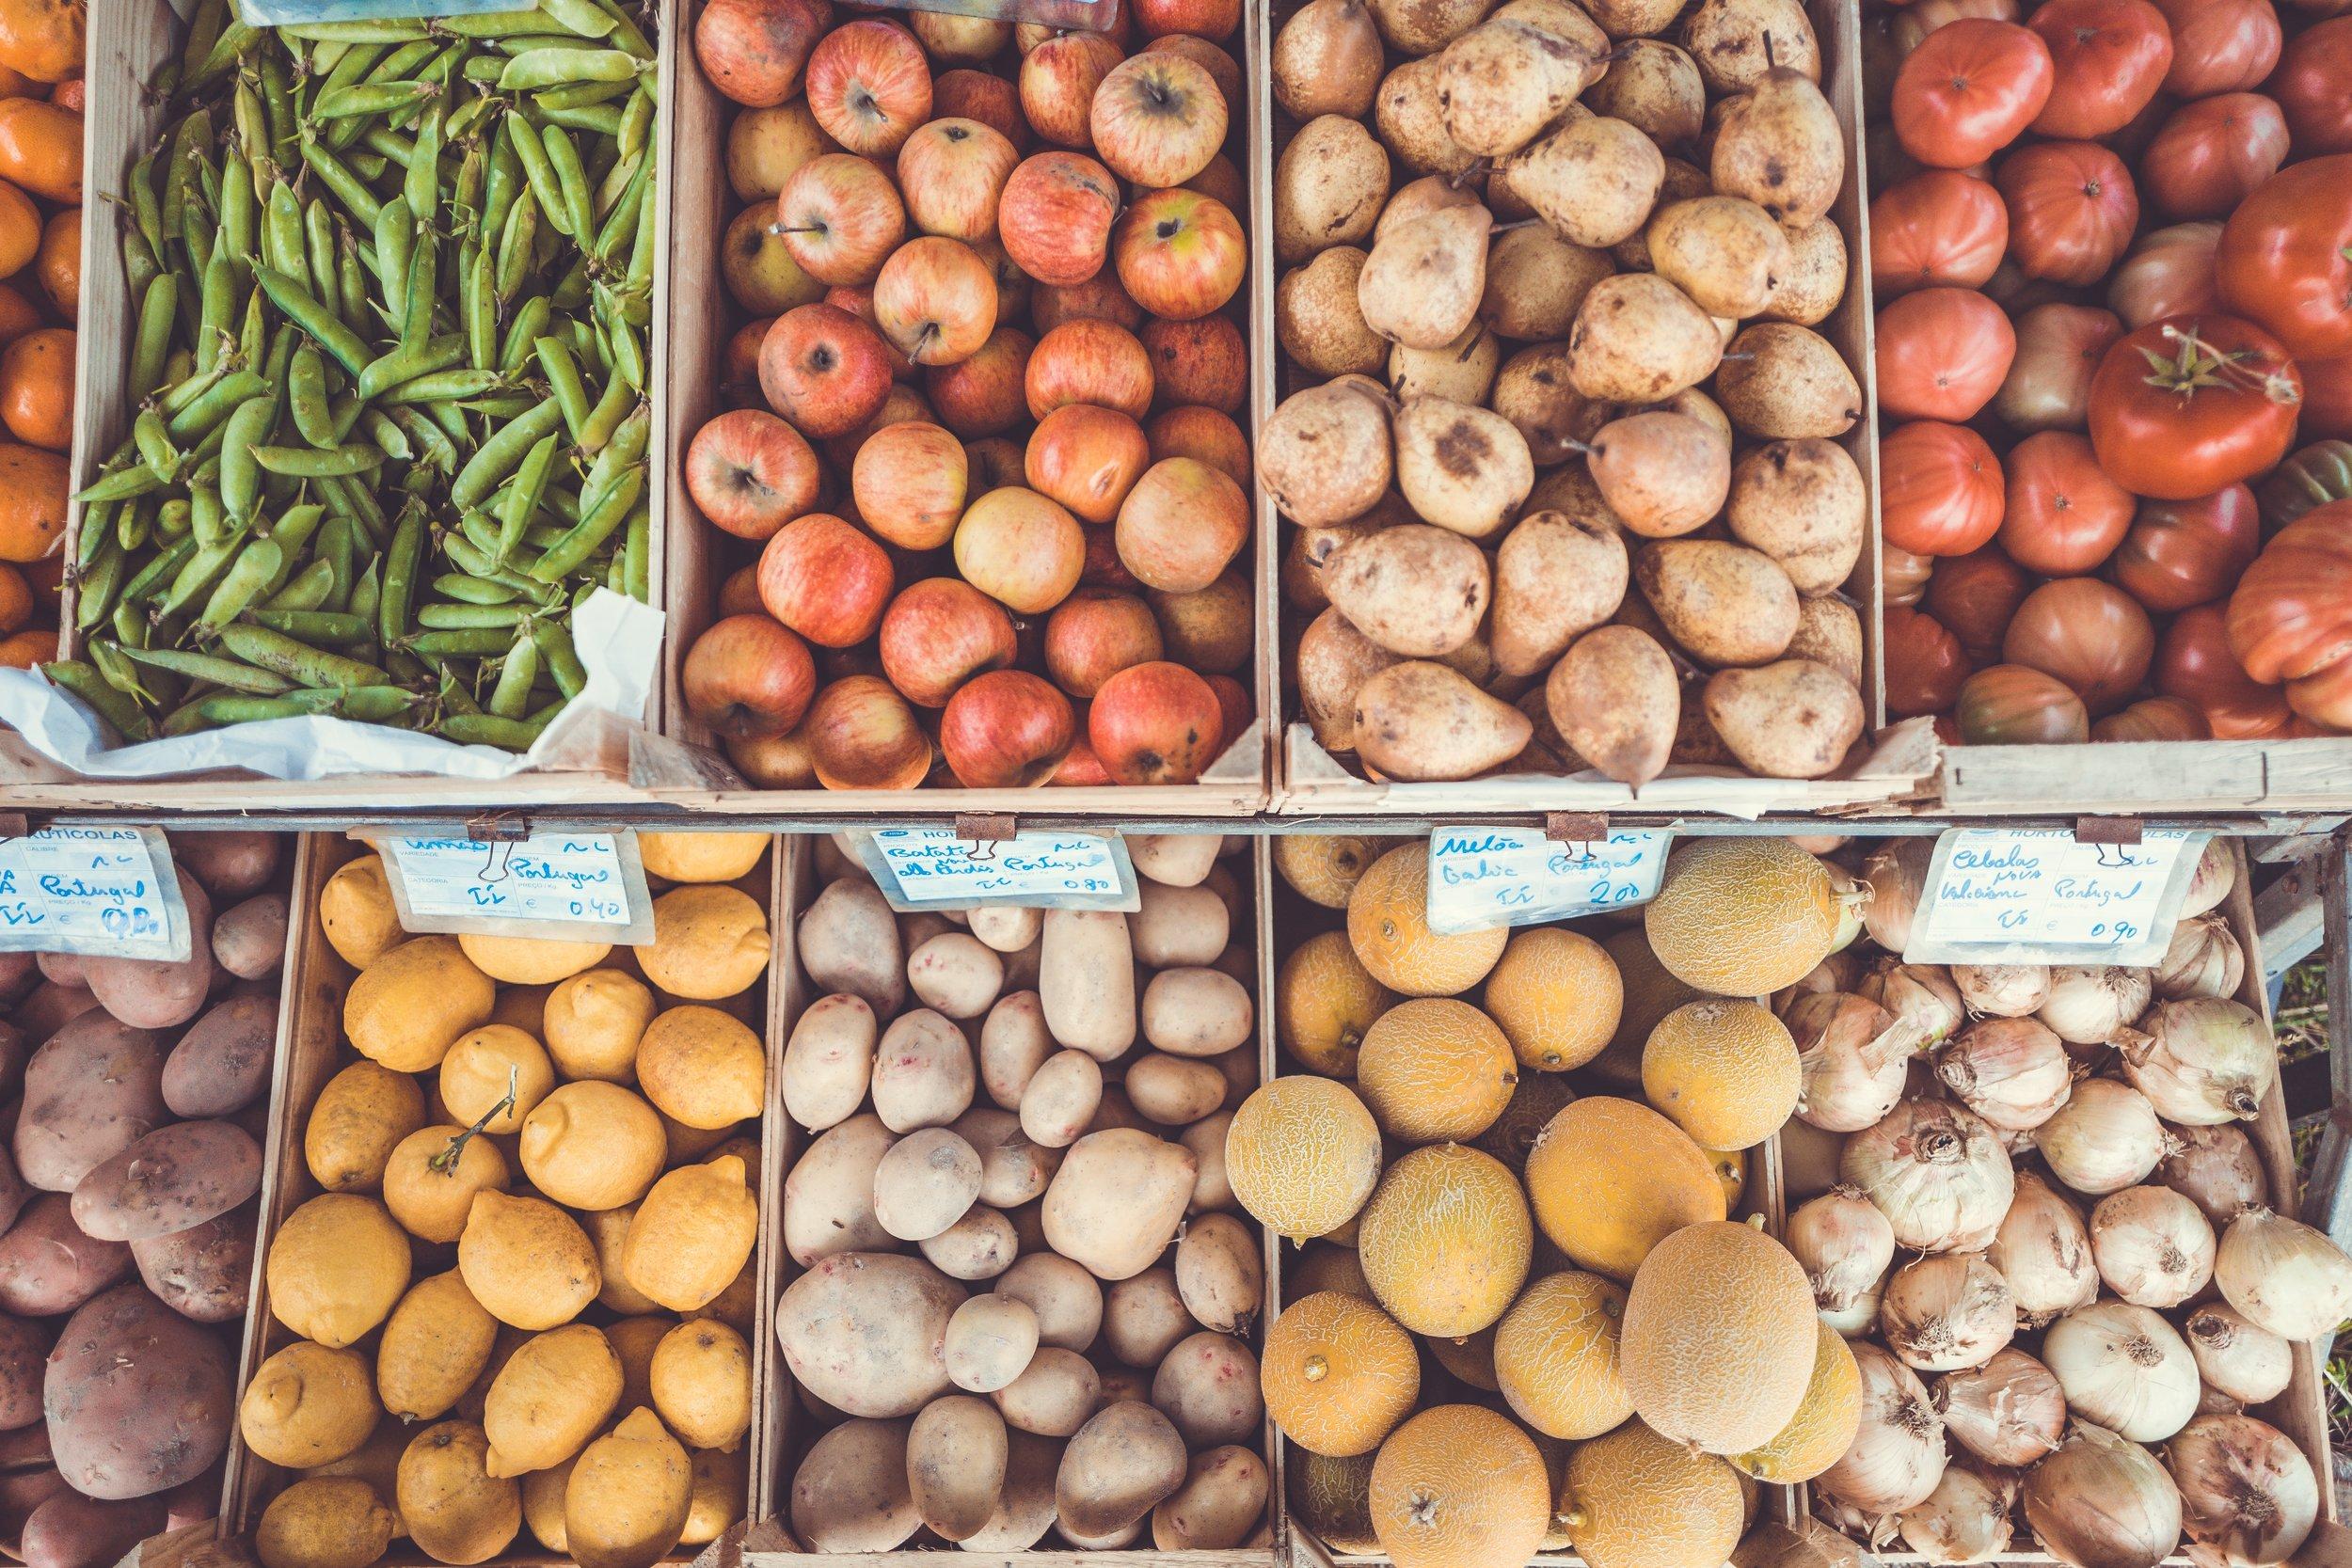 fruits-vegetables.jpg